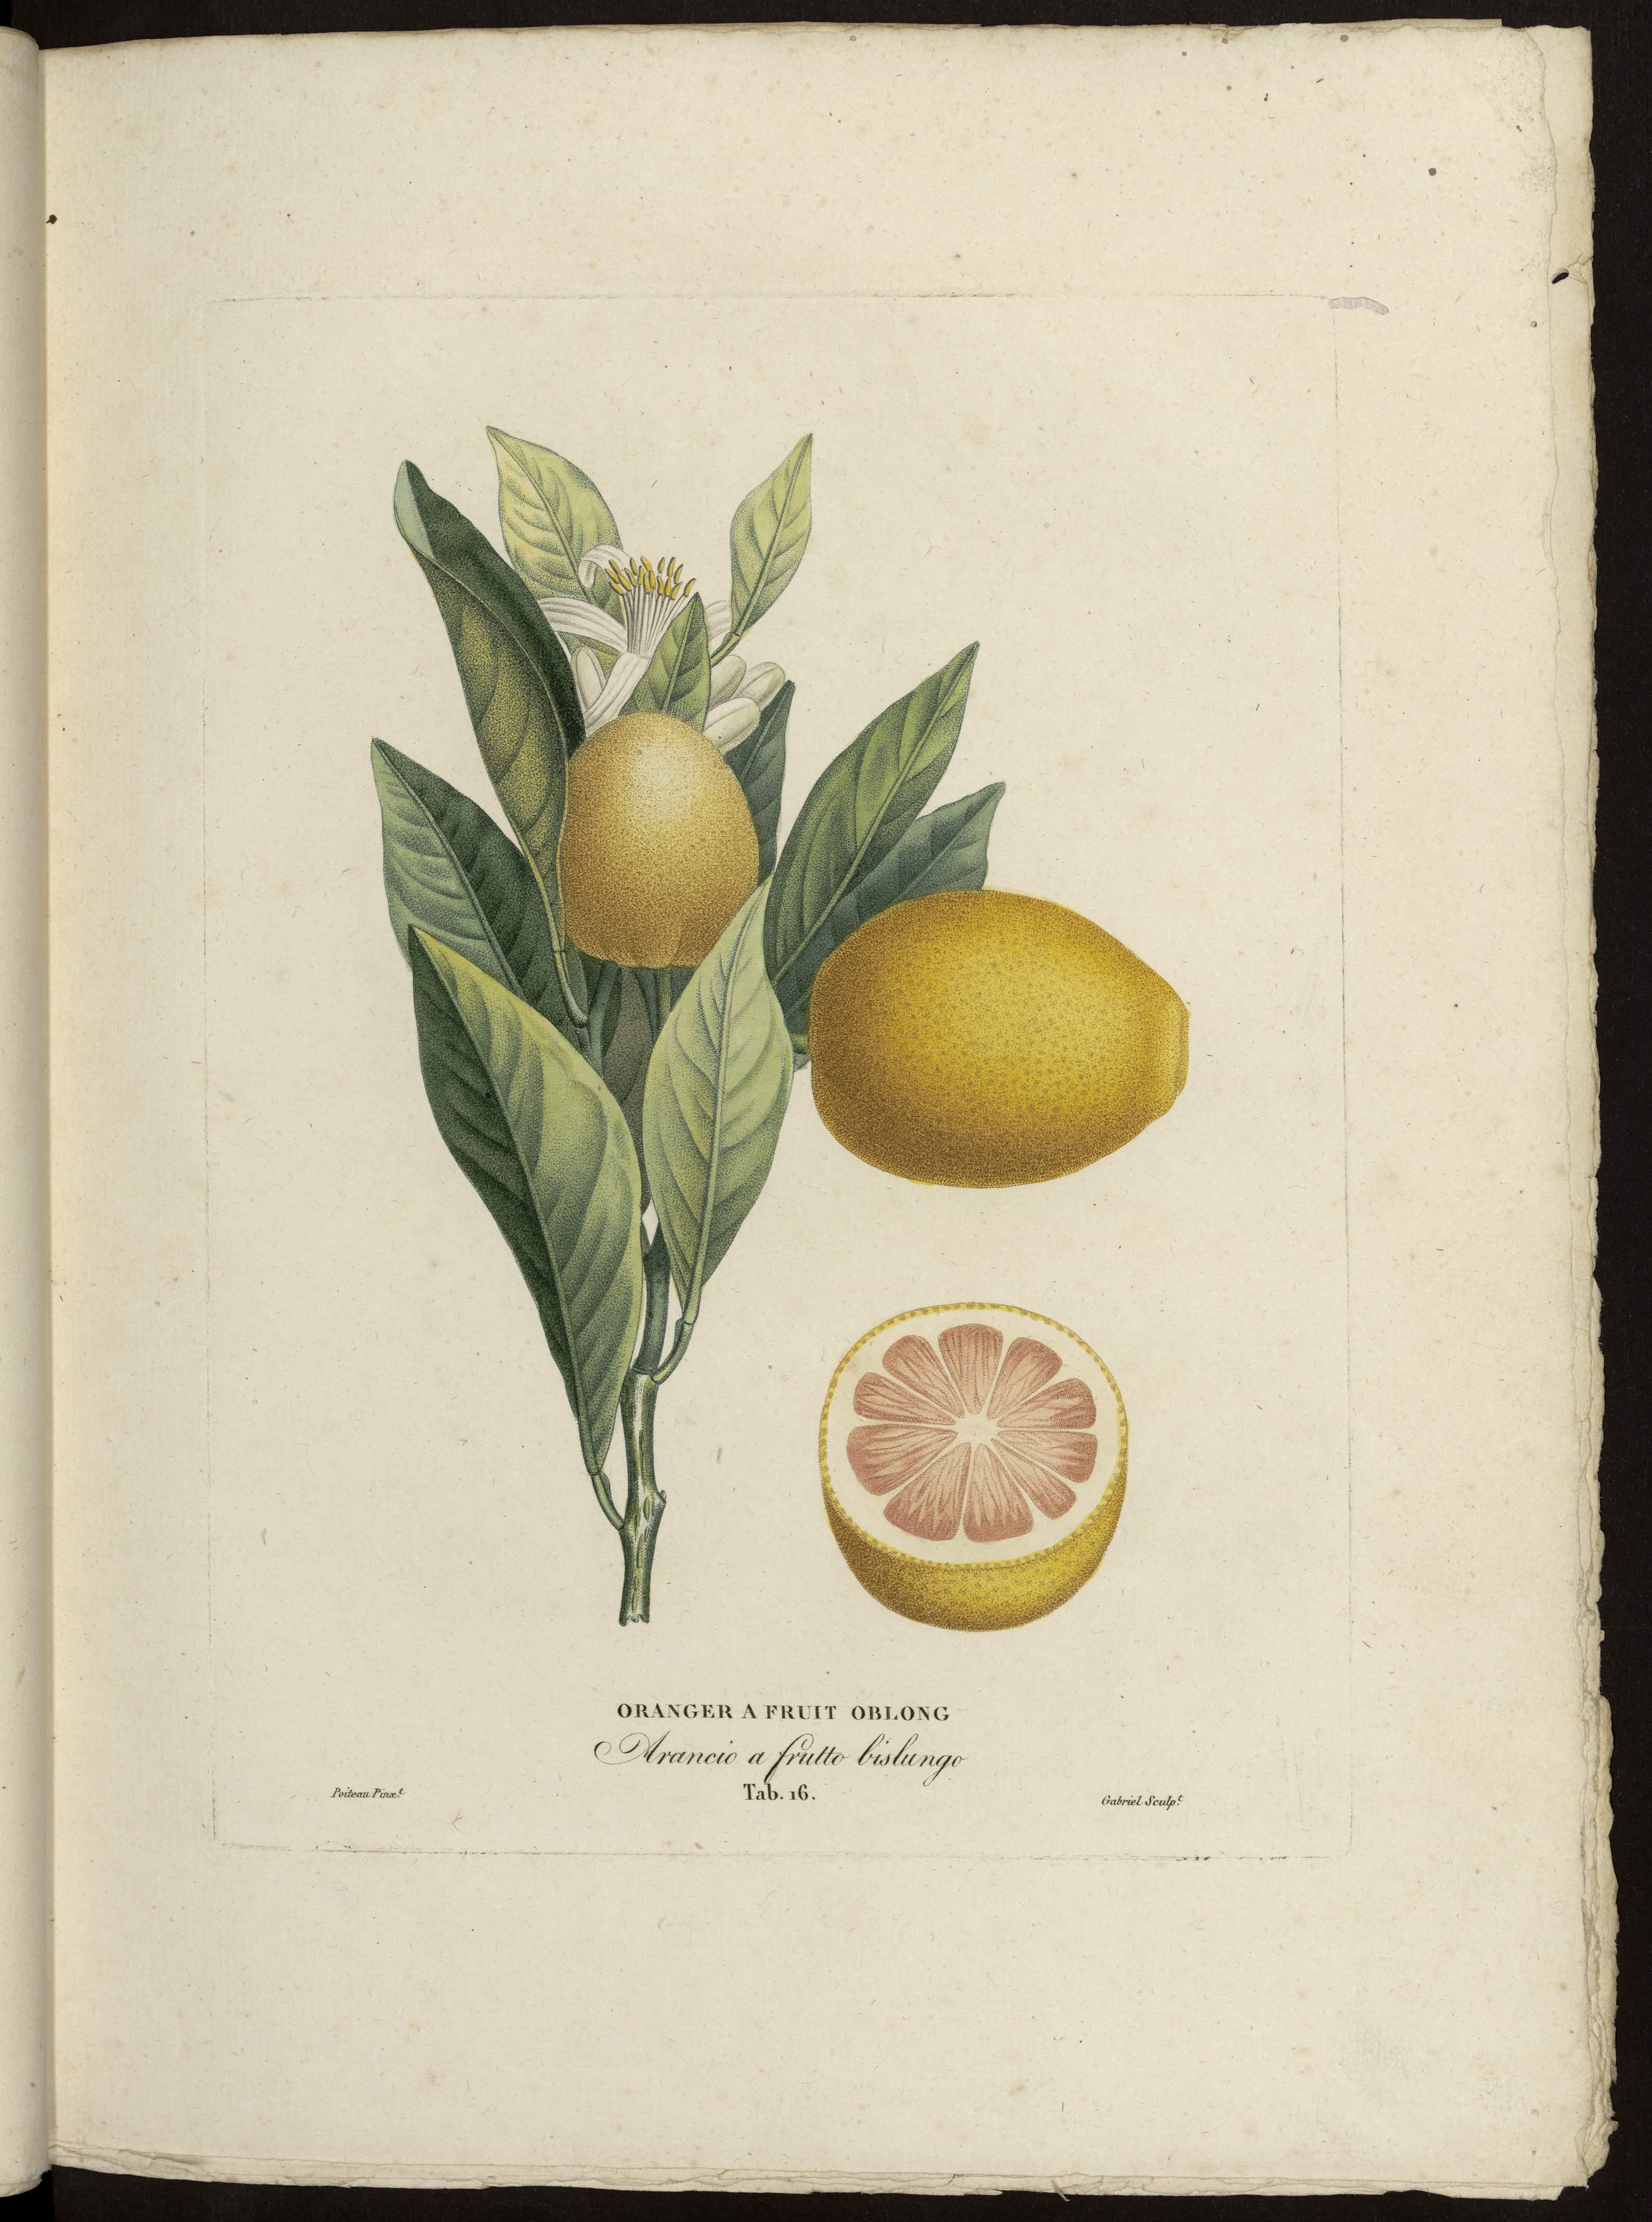 Oranger à fruit oblong